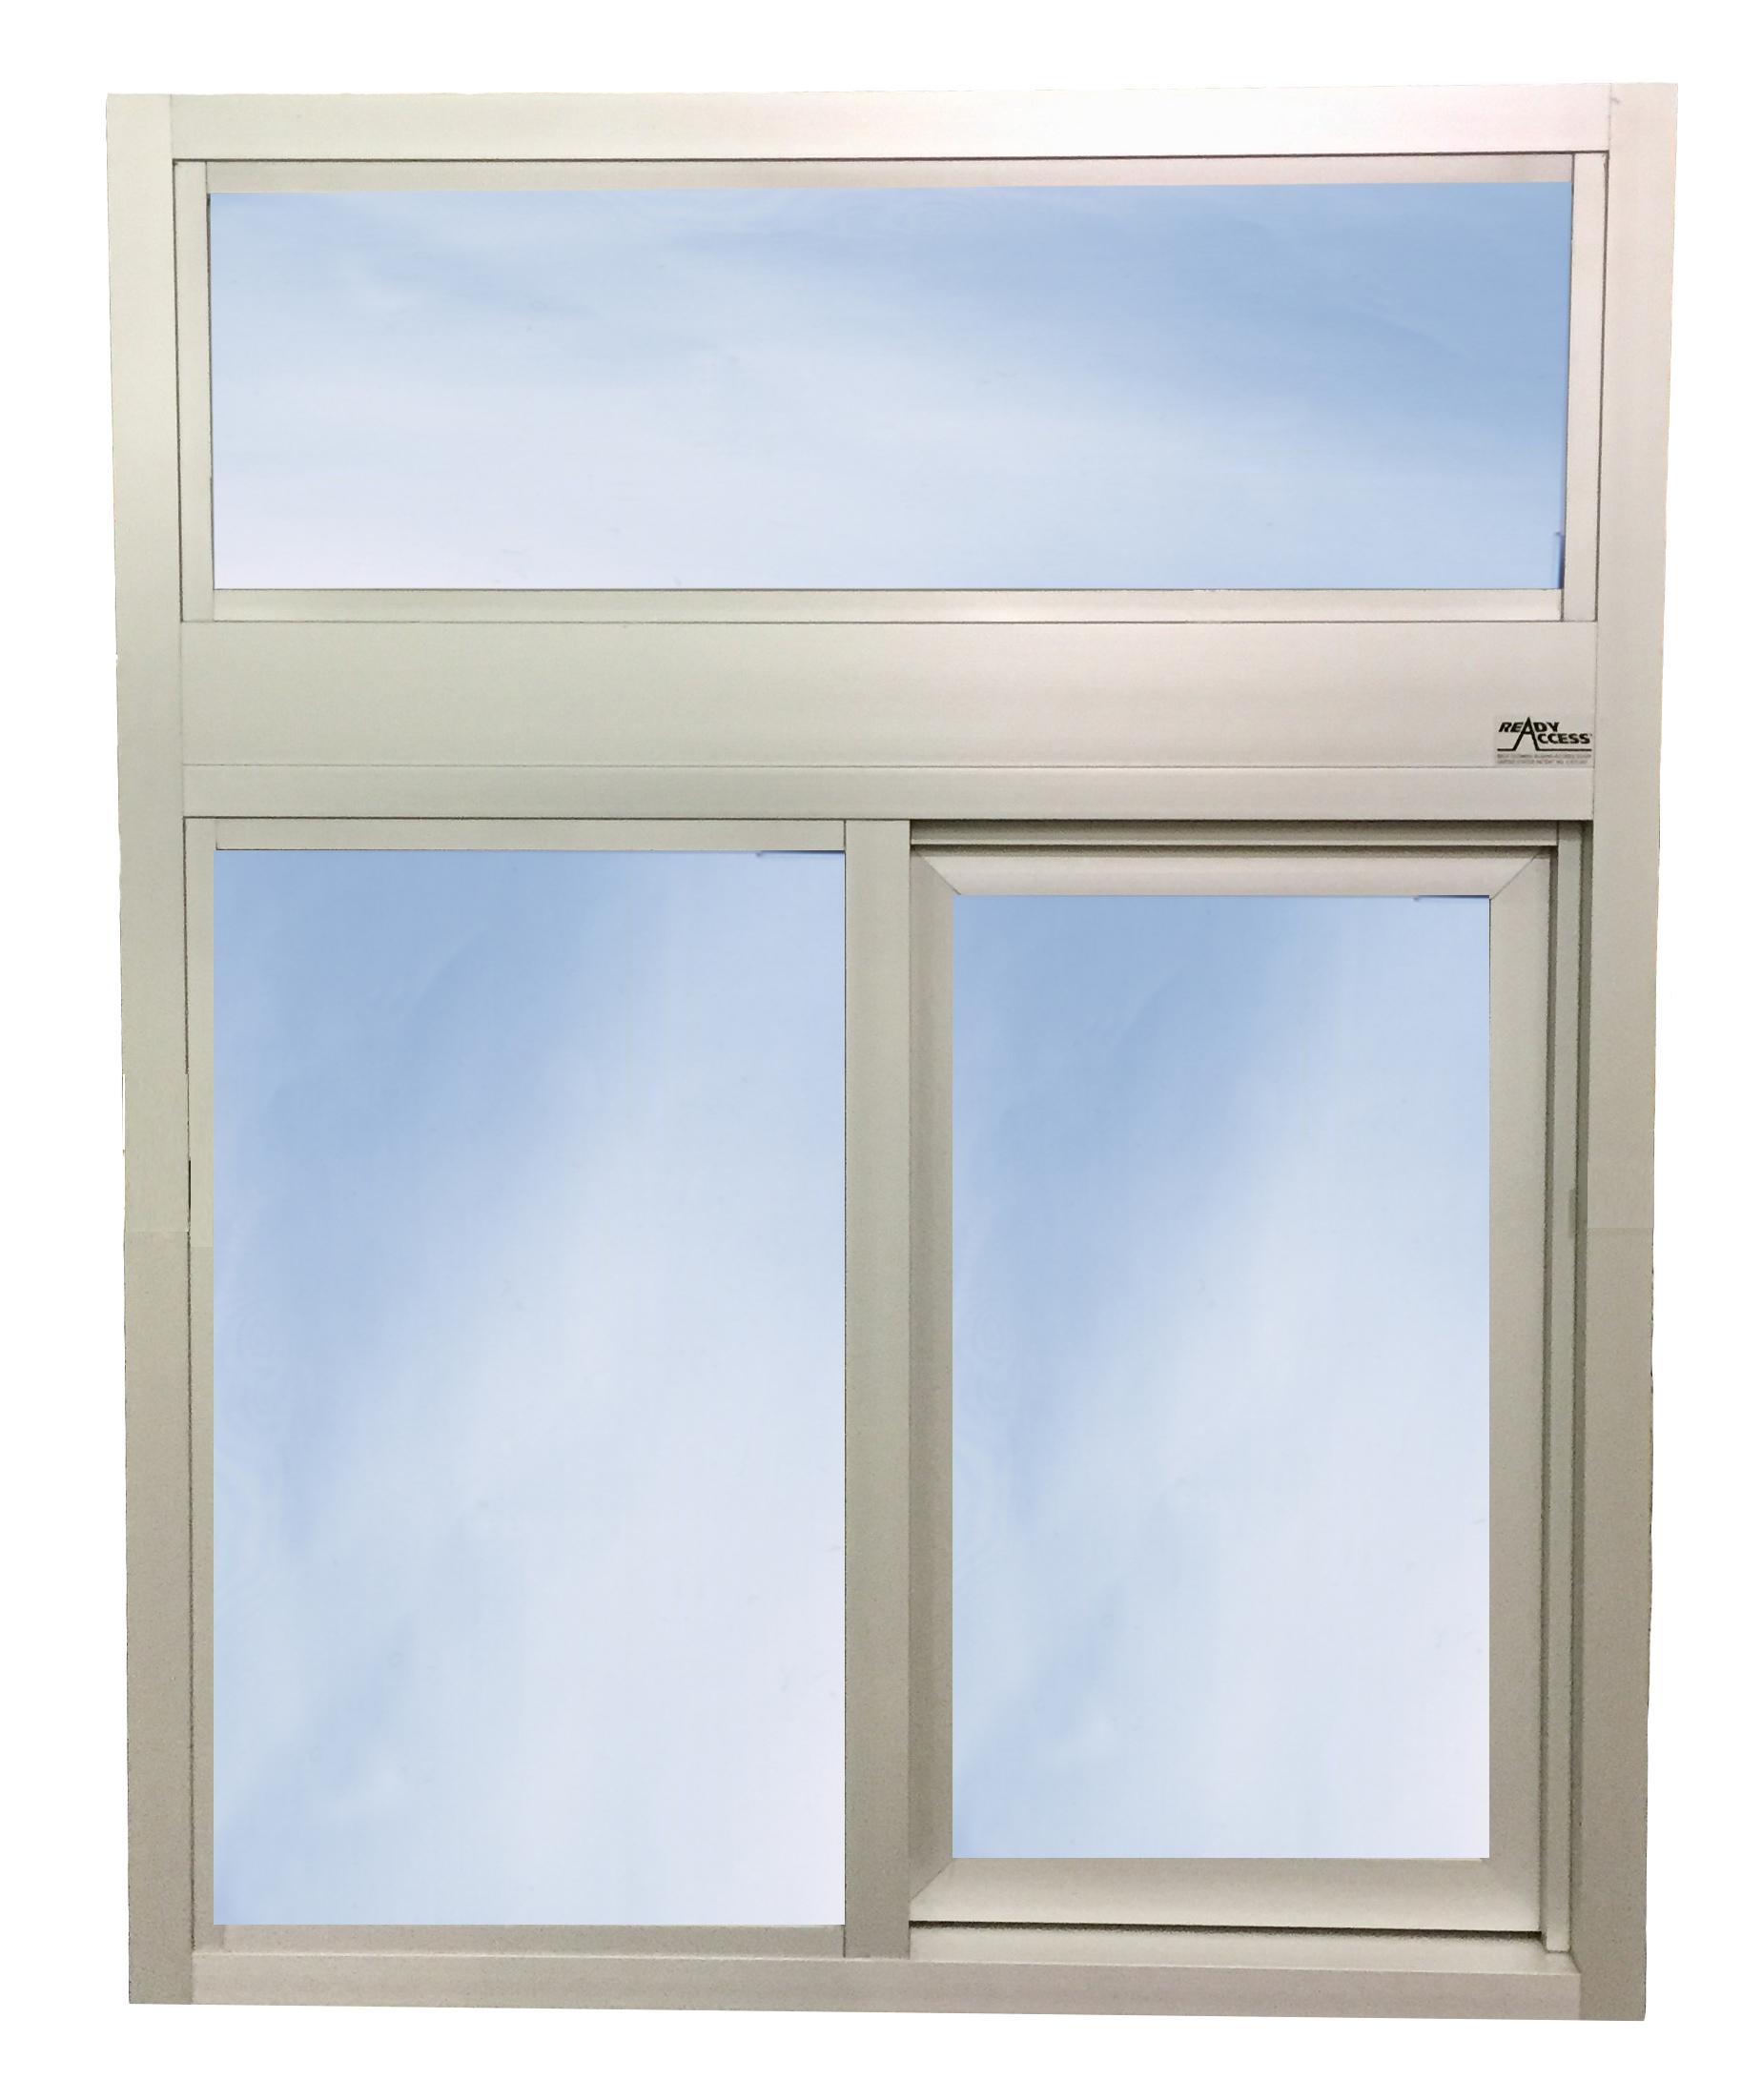 600 w/ Transom/Air Curtain